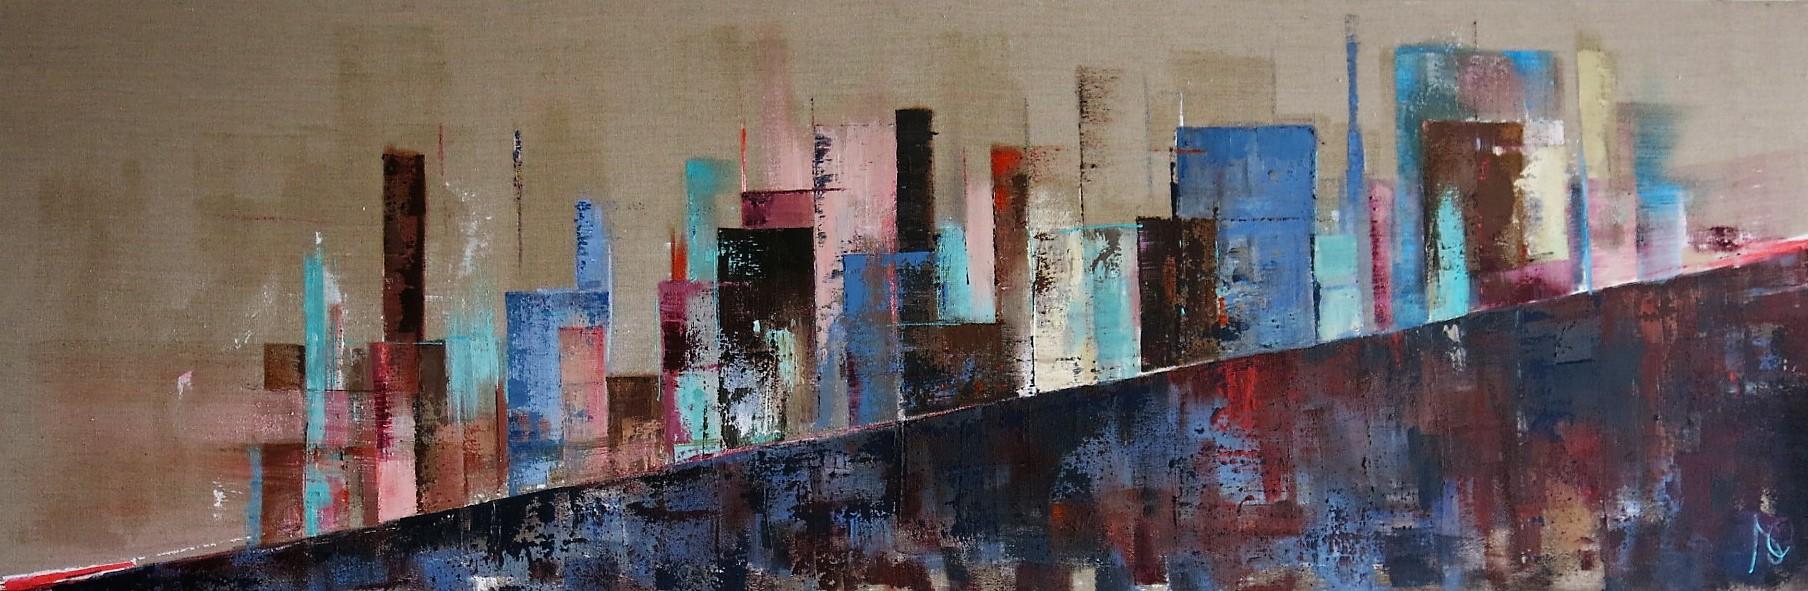 Les docks 2